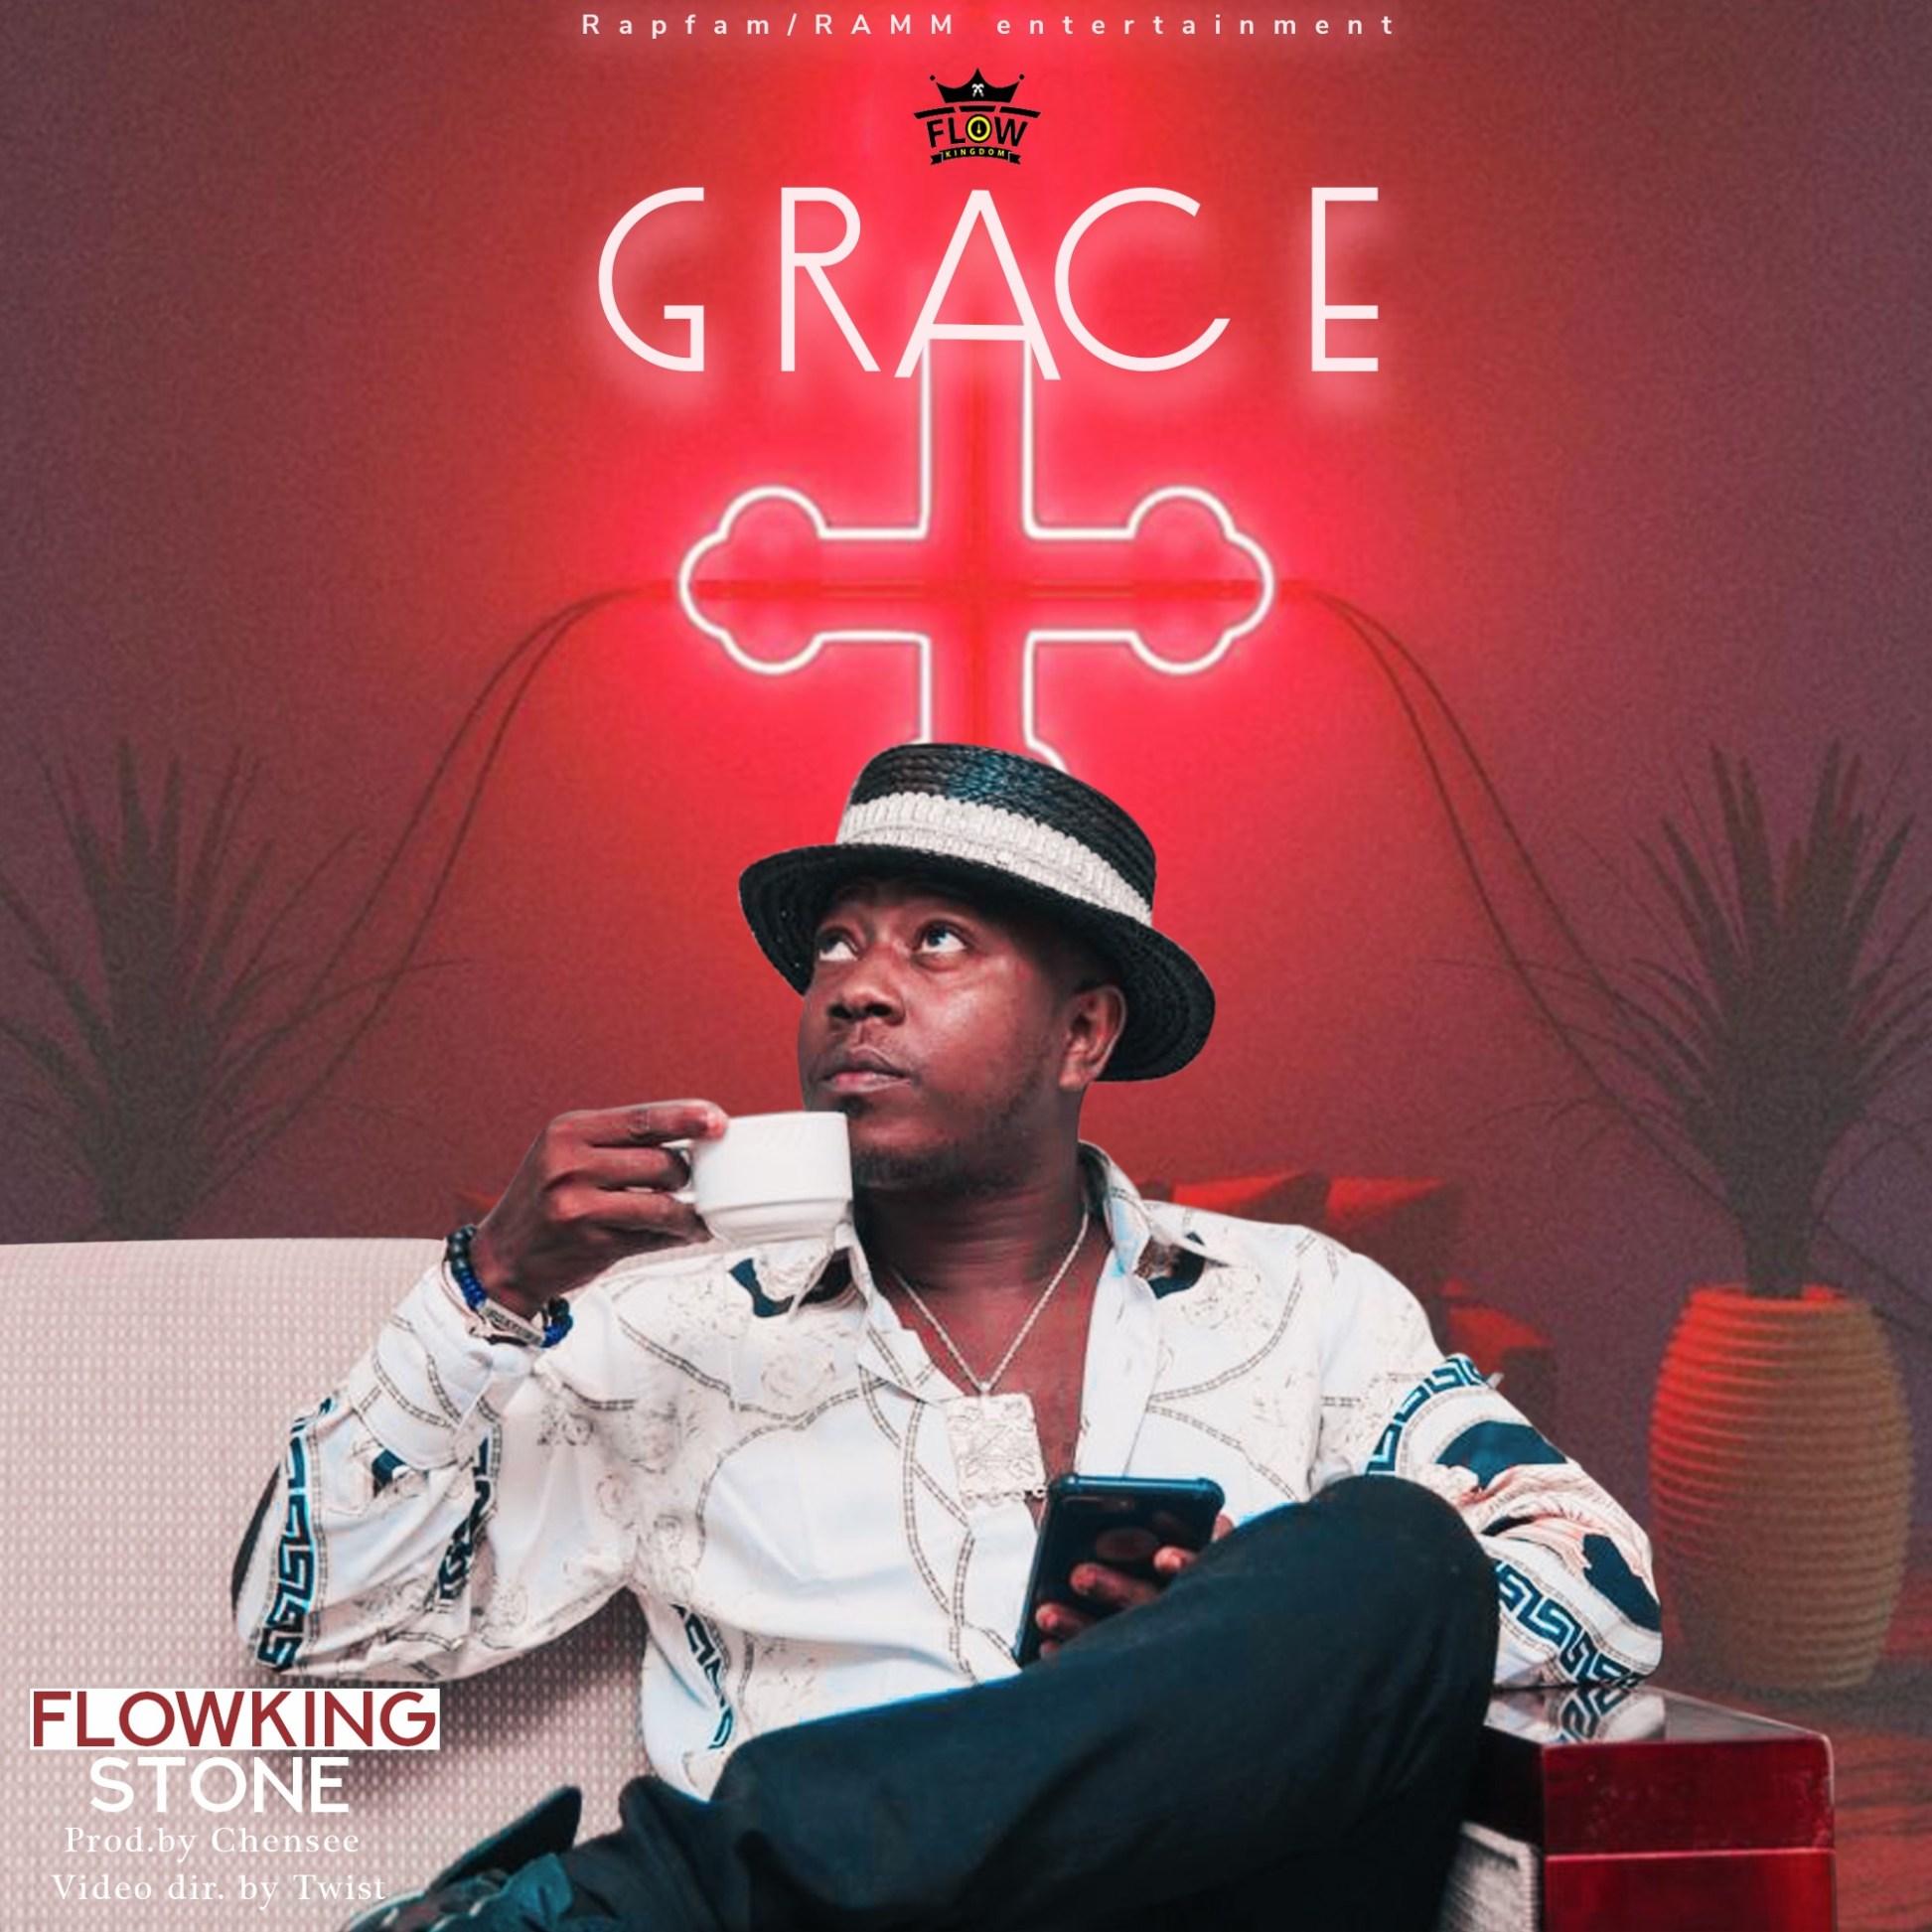 Flowking Stone – Grace (Prod. Chensee Beatz)